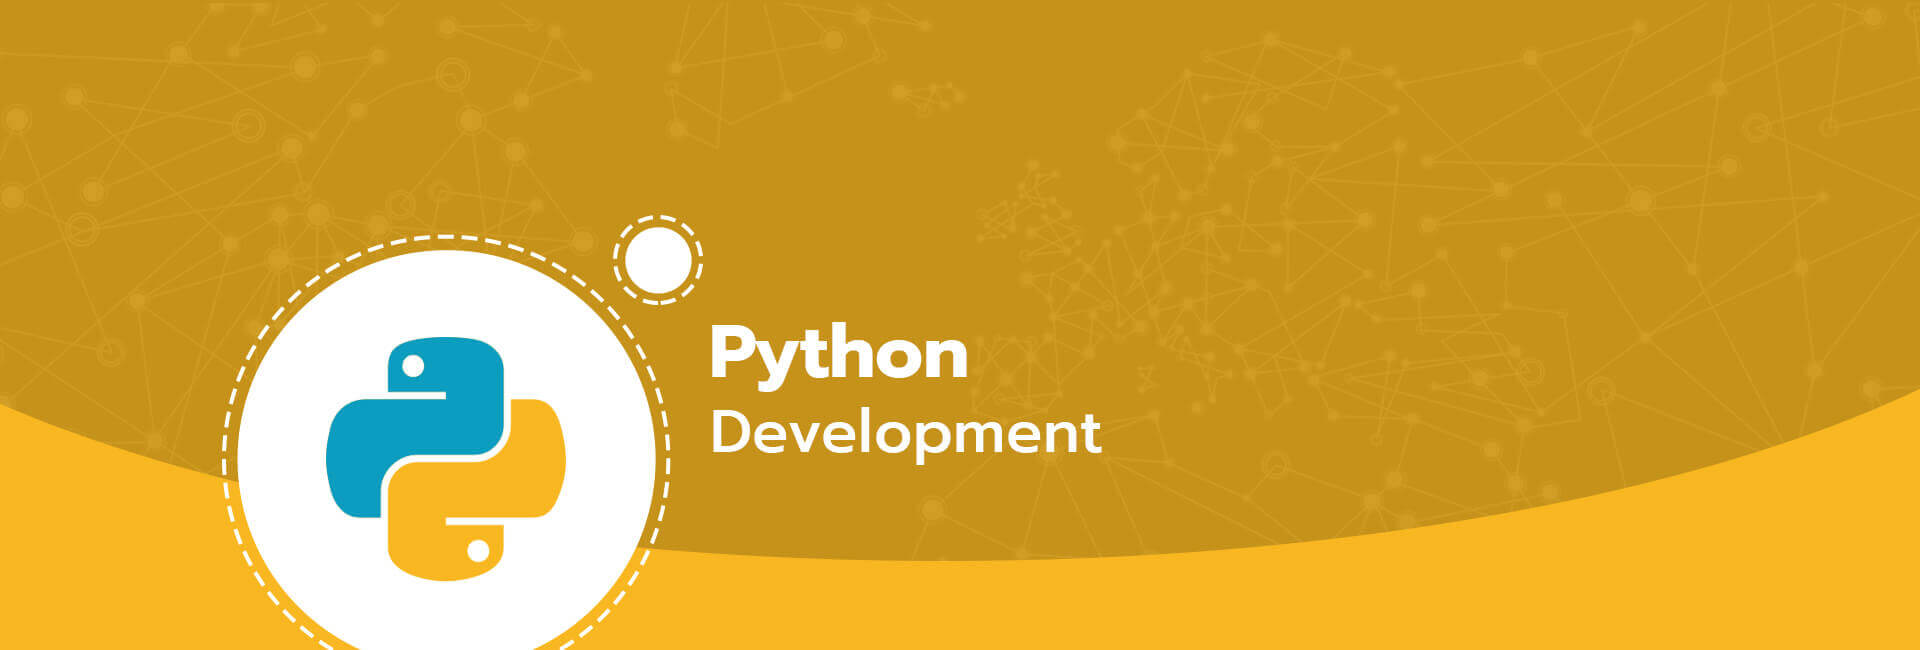 Python Web Development Company, Python Development Services